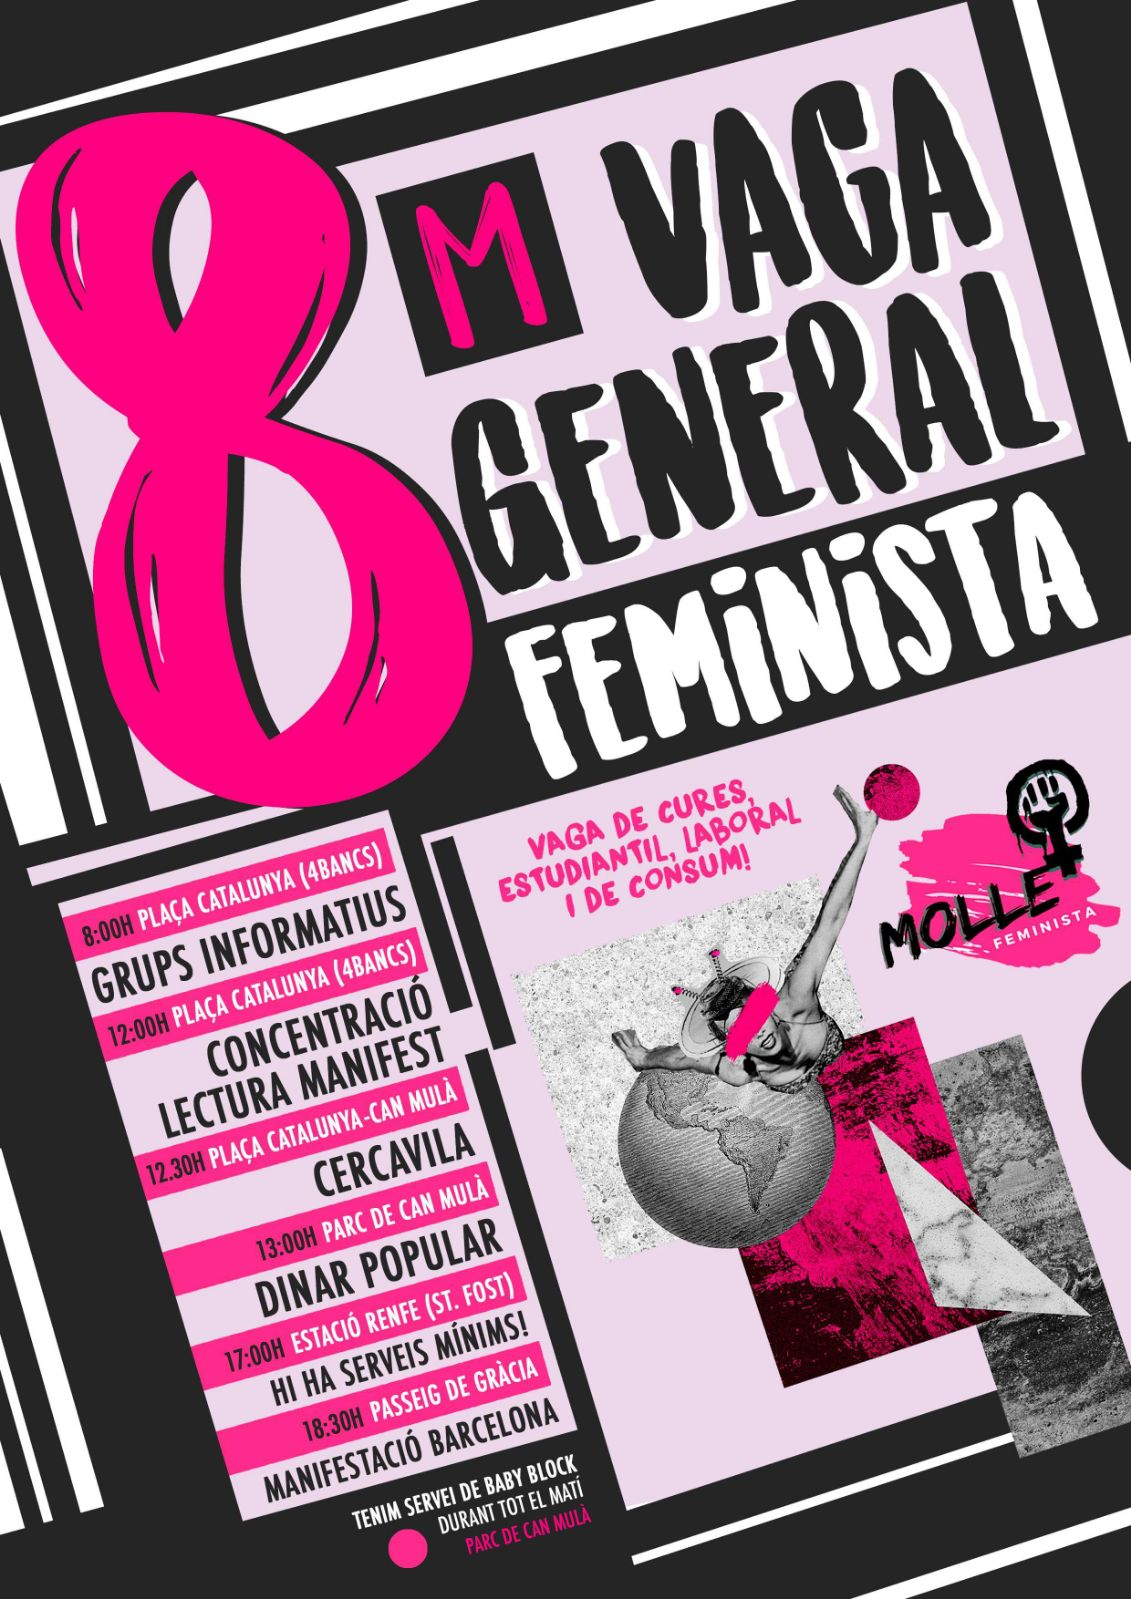 Vaga Feminista a Mollet